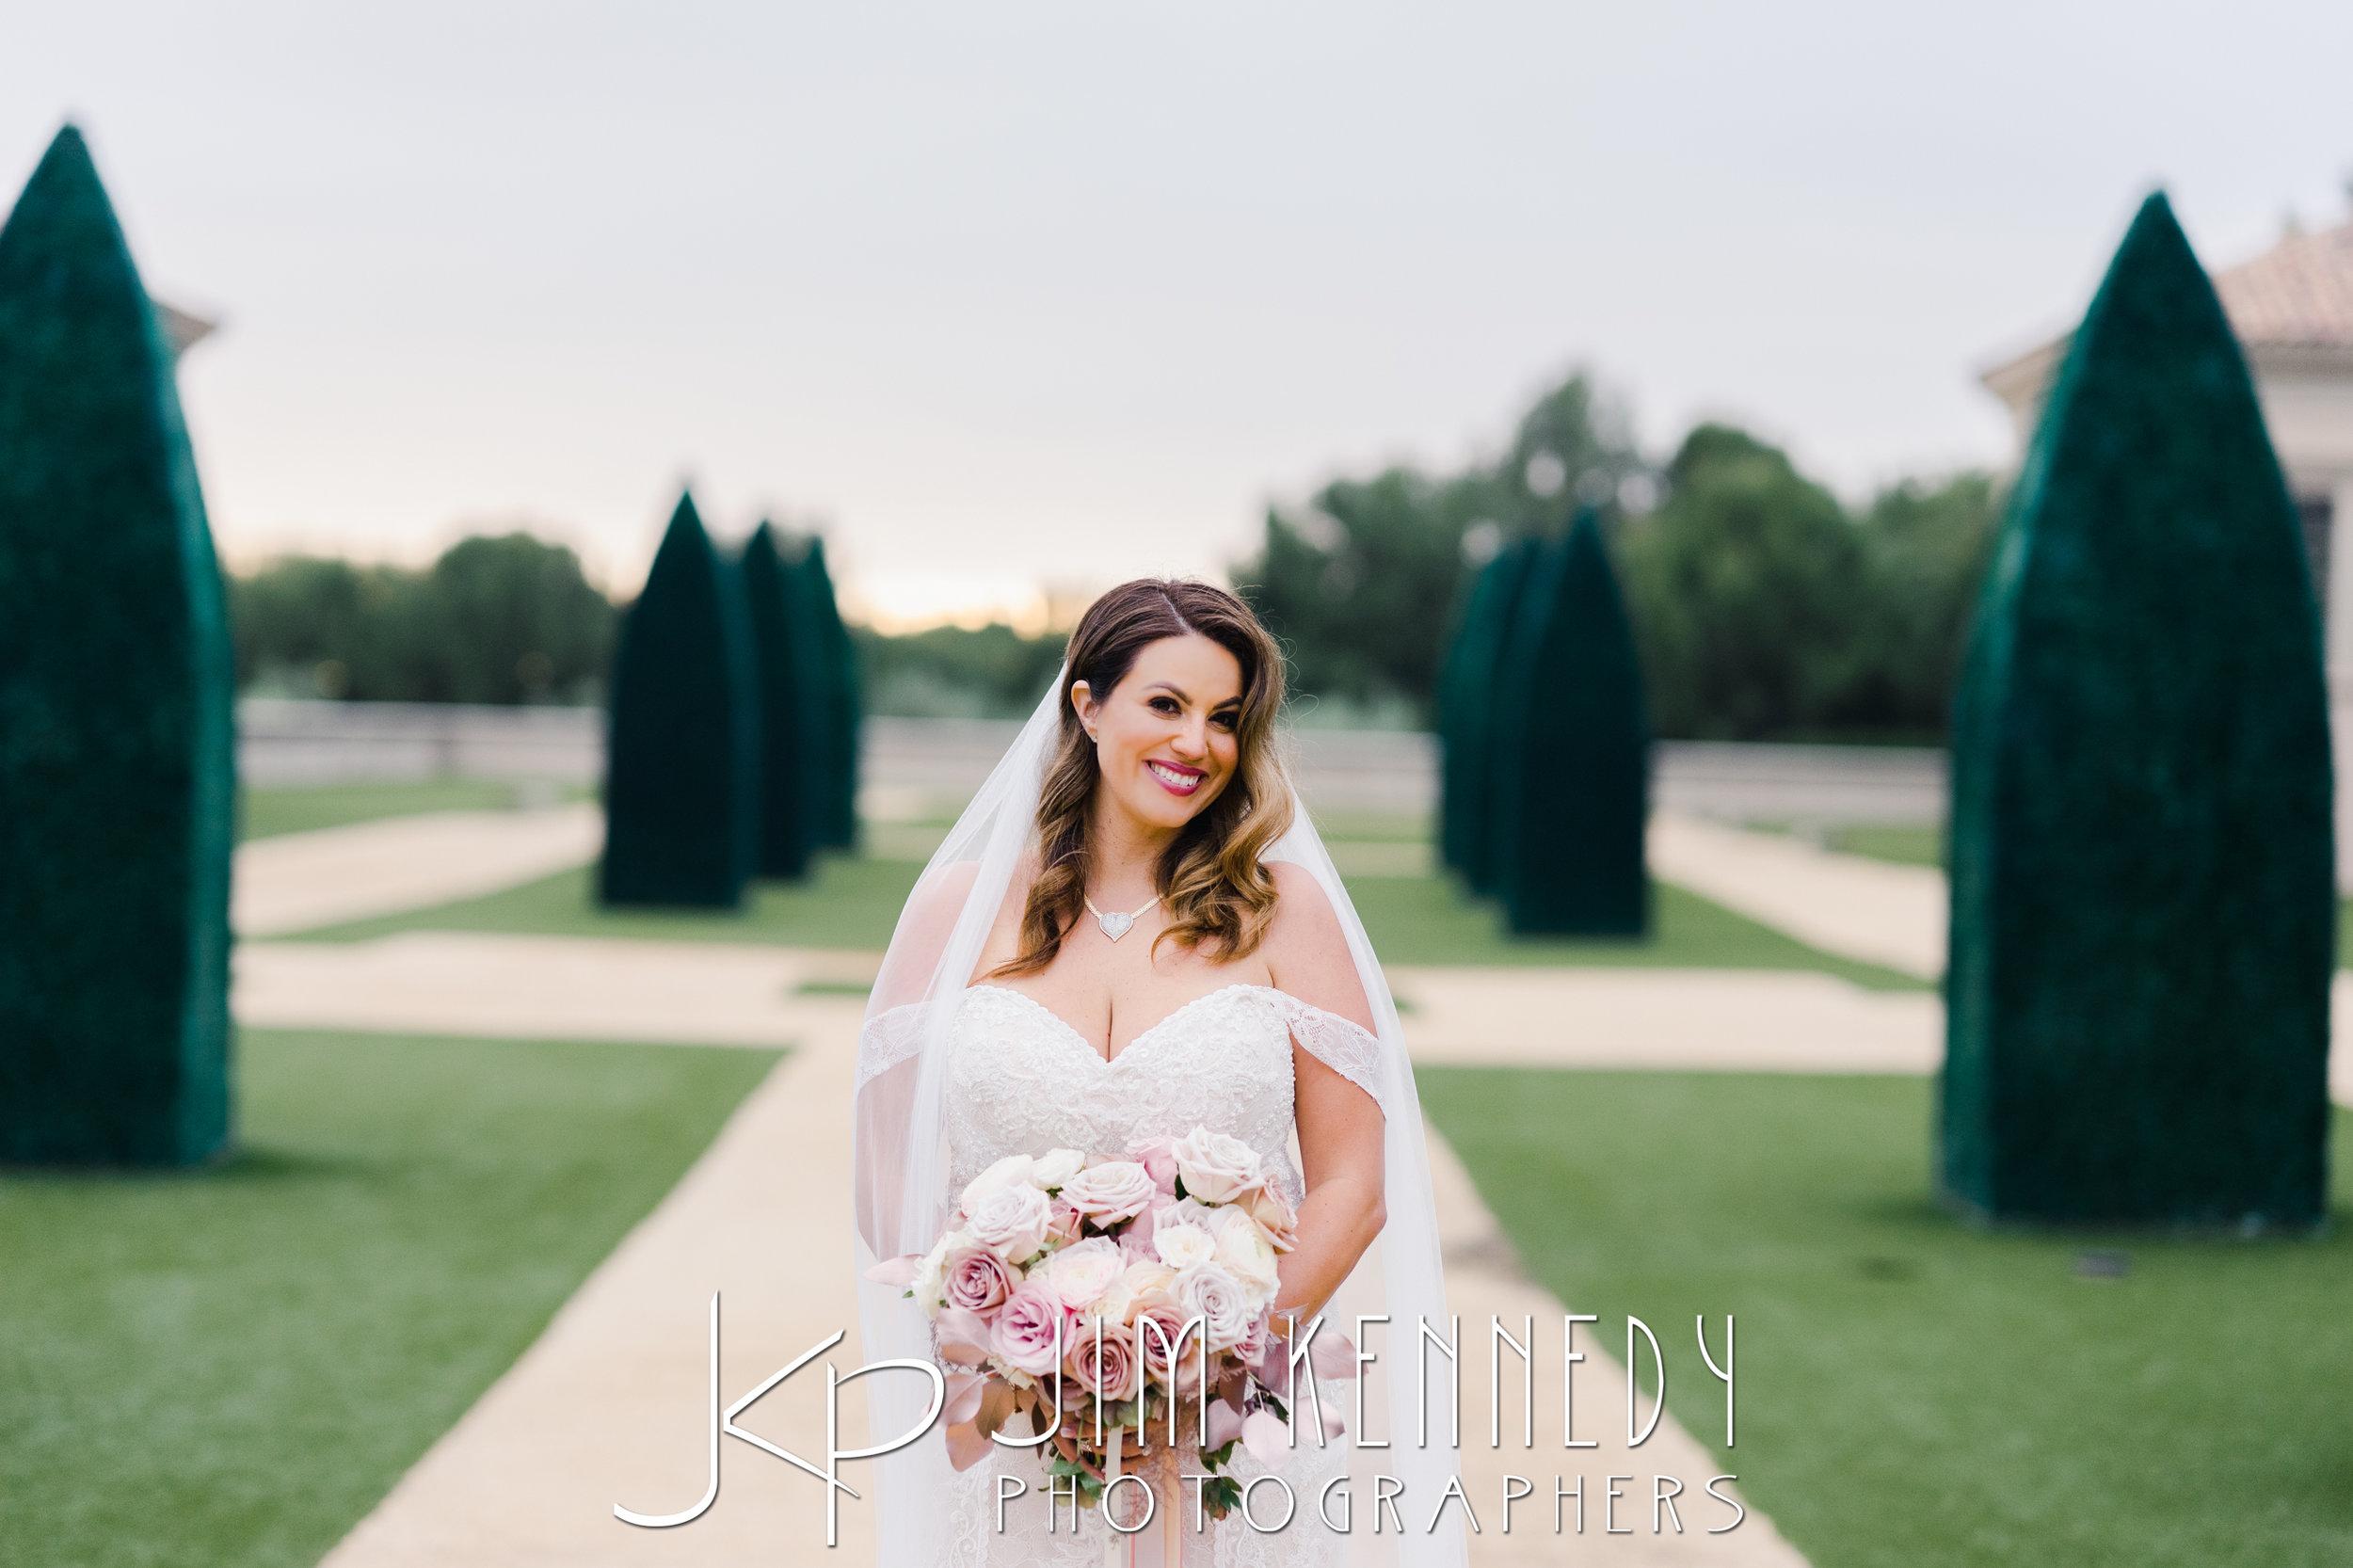 pelican-hill-wedding-jim-kenedy-photographers_0179.JPG